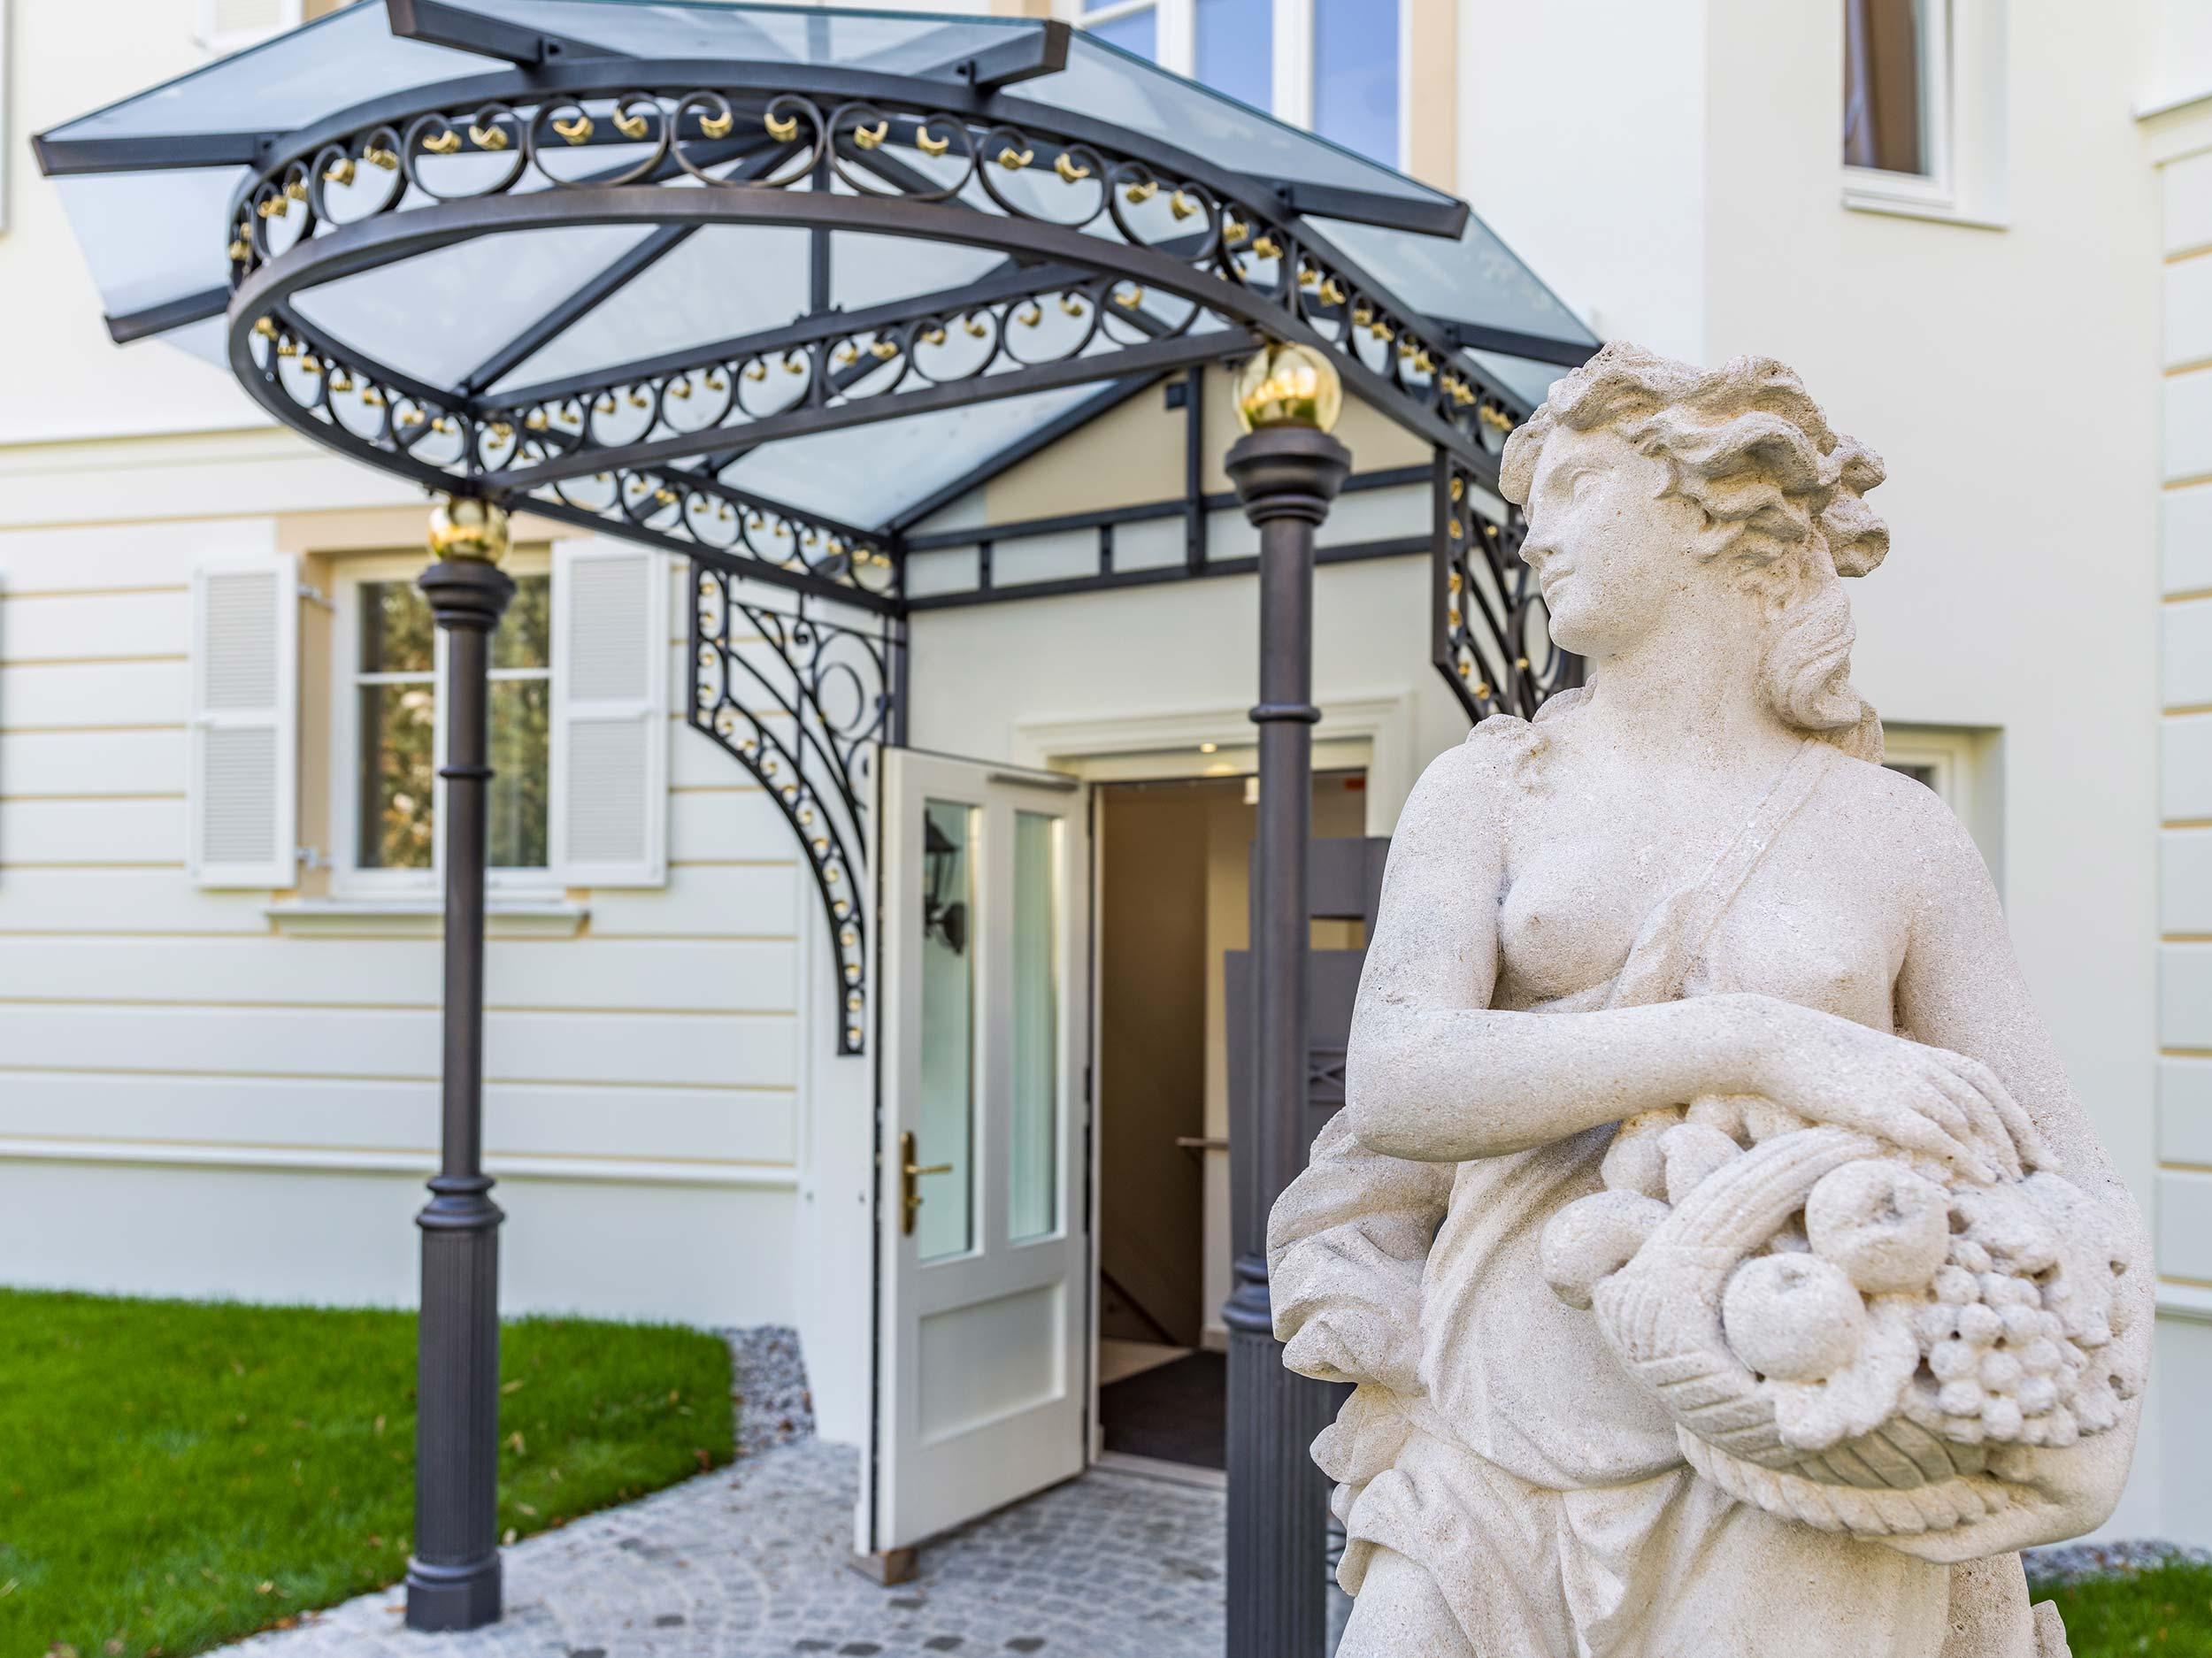 Palazzo Verena in Innsbruck